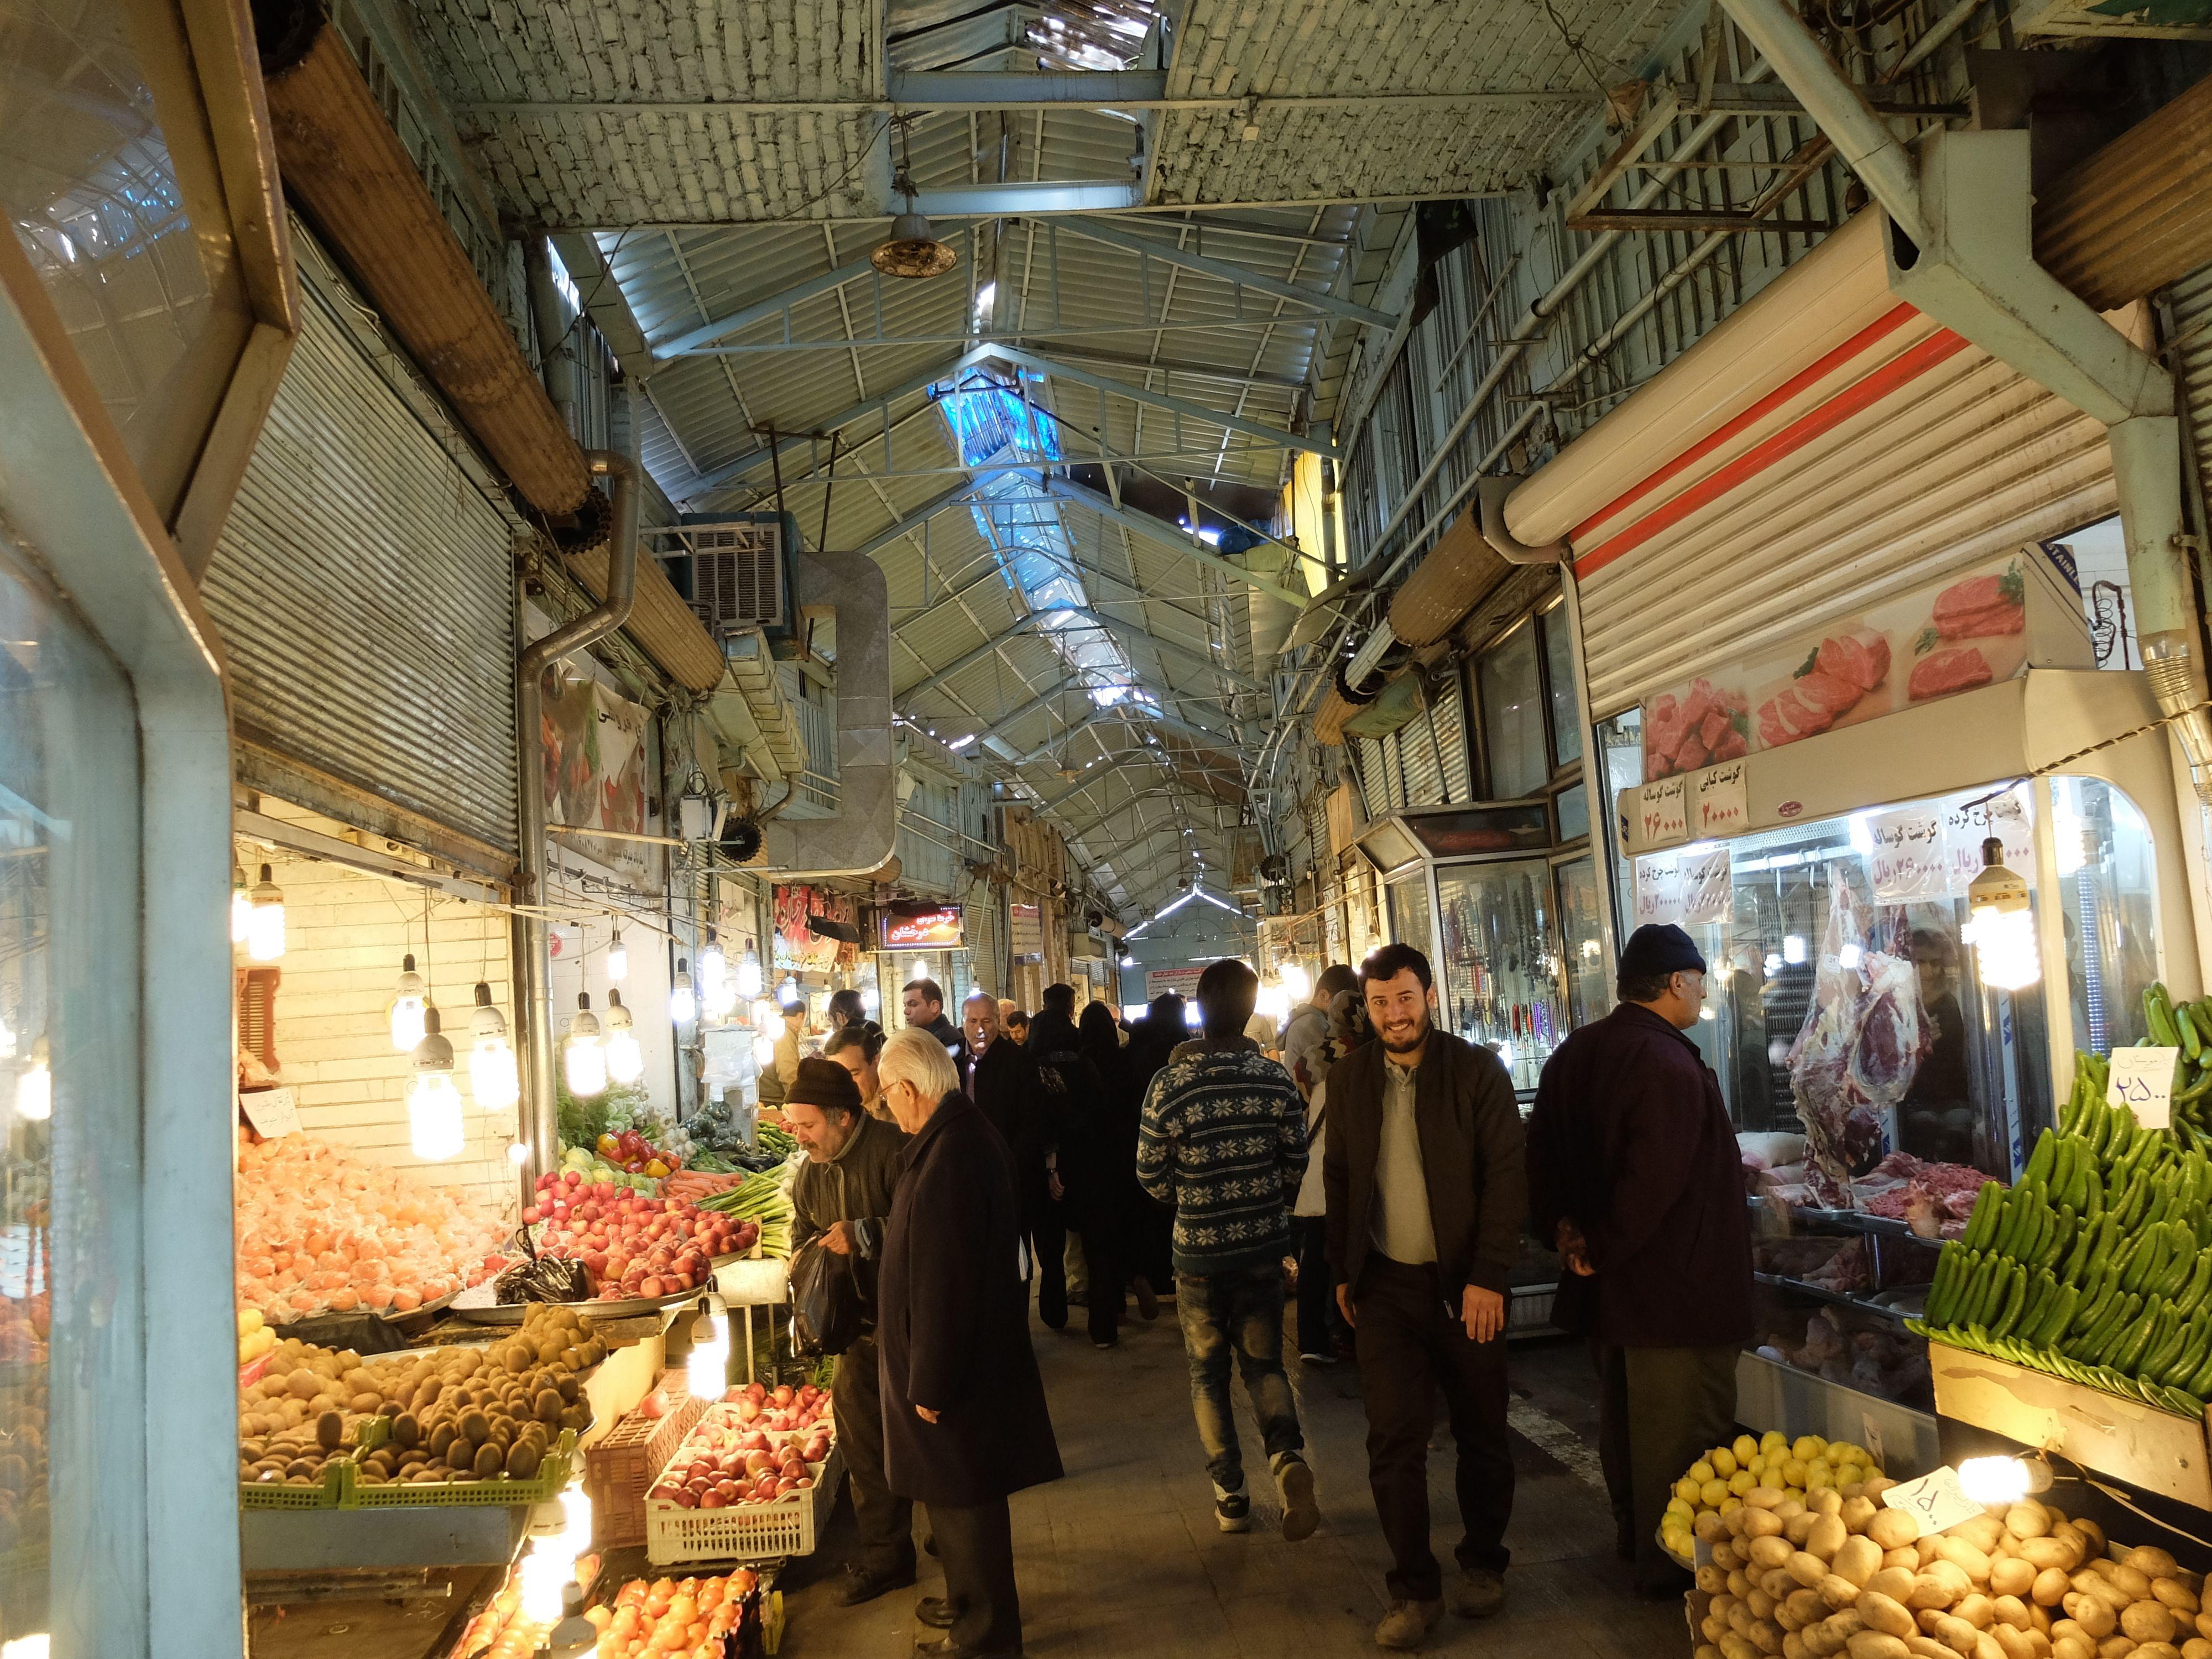 Neghar Khaneh Fruit & Vegetable Bazaar Tabriz